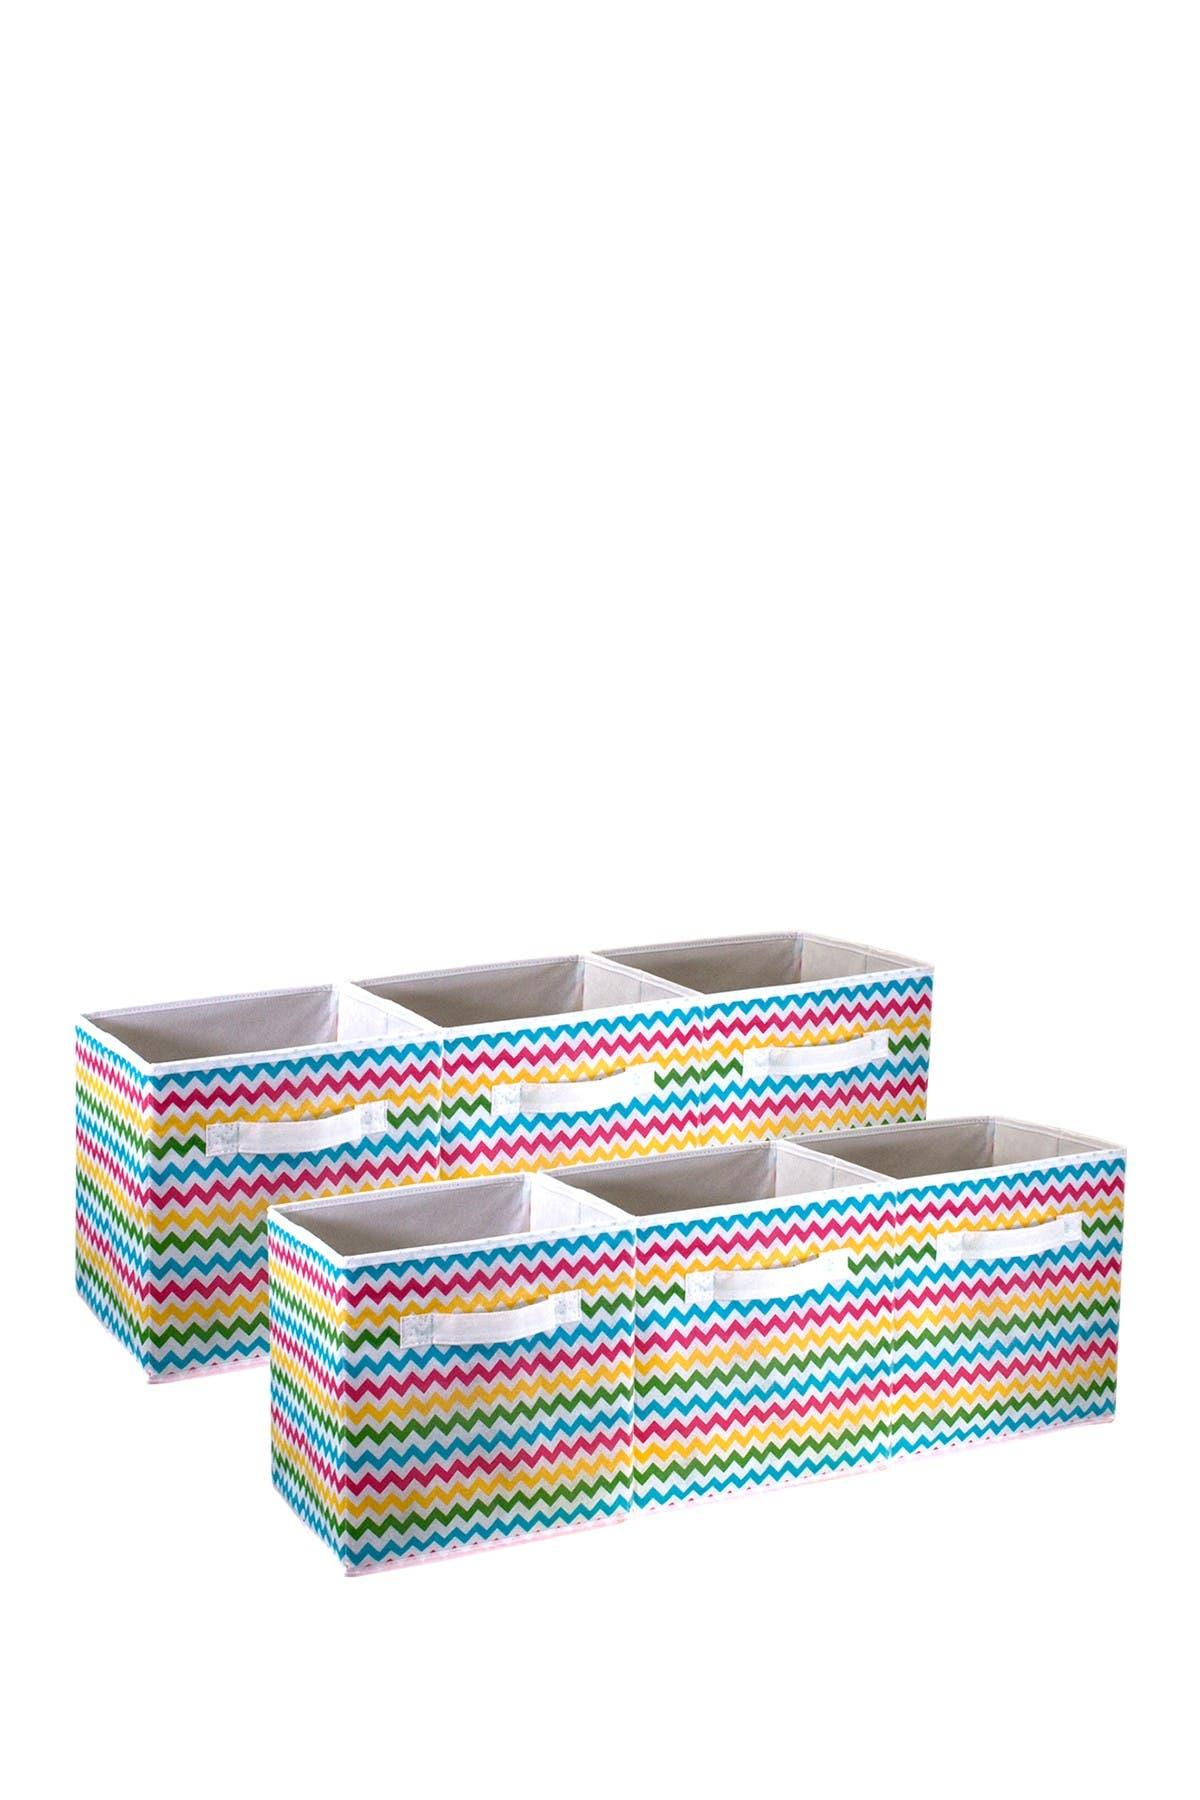 Image of Sorbus Chevron Multi-Colored Pattern Storage Bins - Set of 6